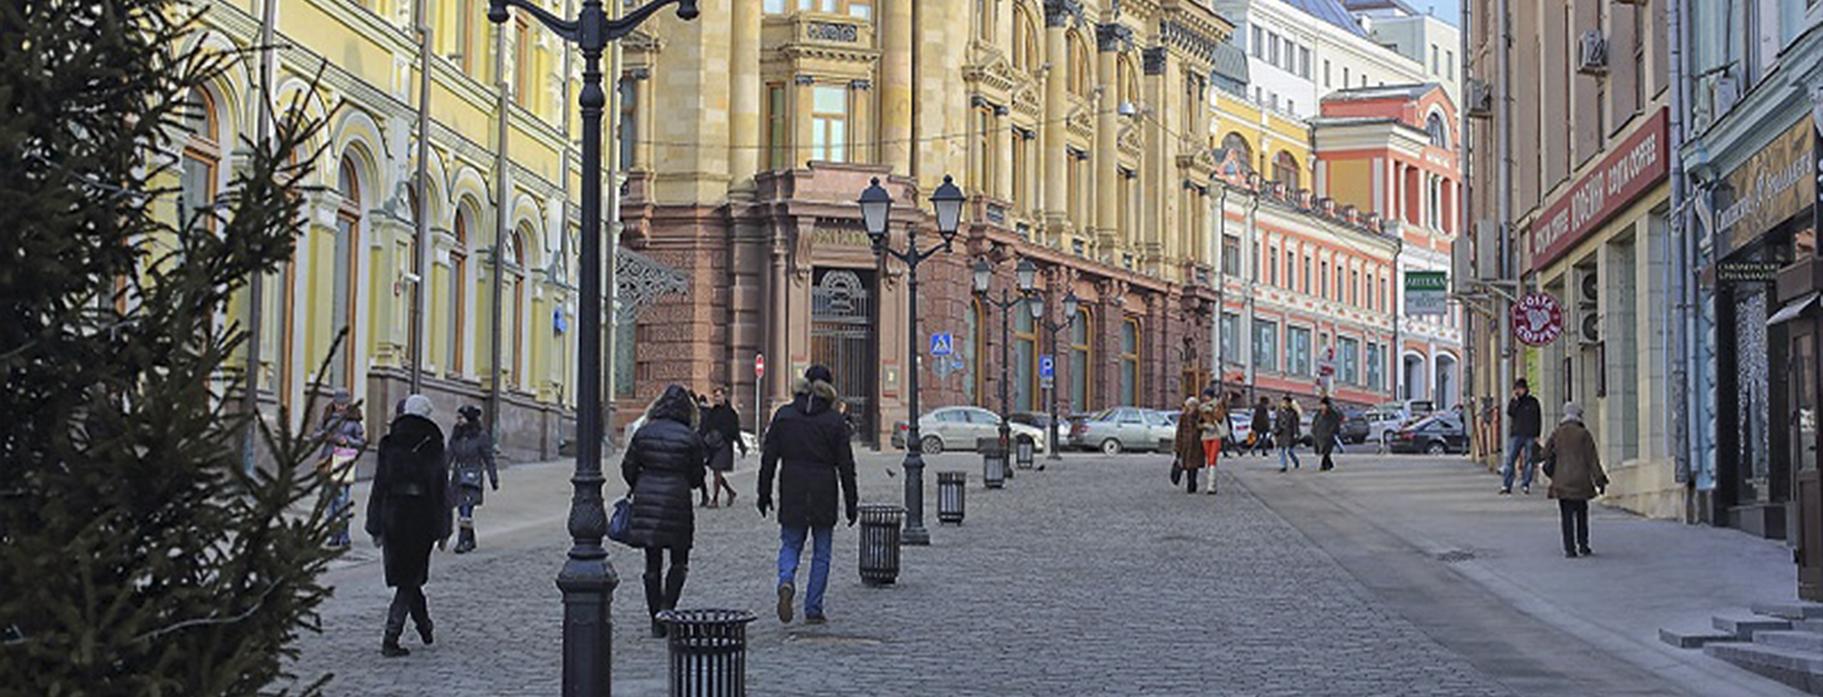 Как появилась улица Кузнецкий мост и куда исчез мост?